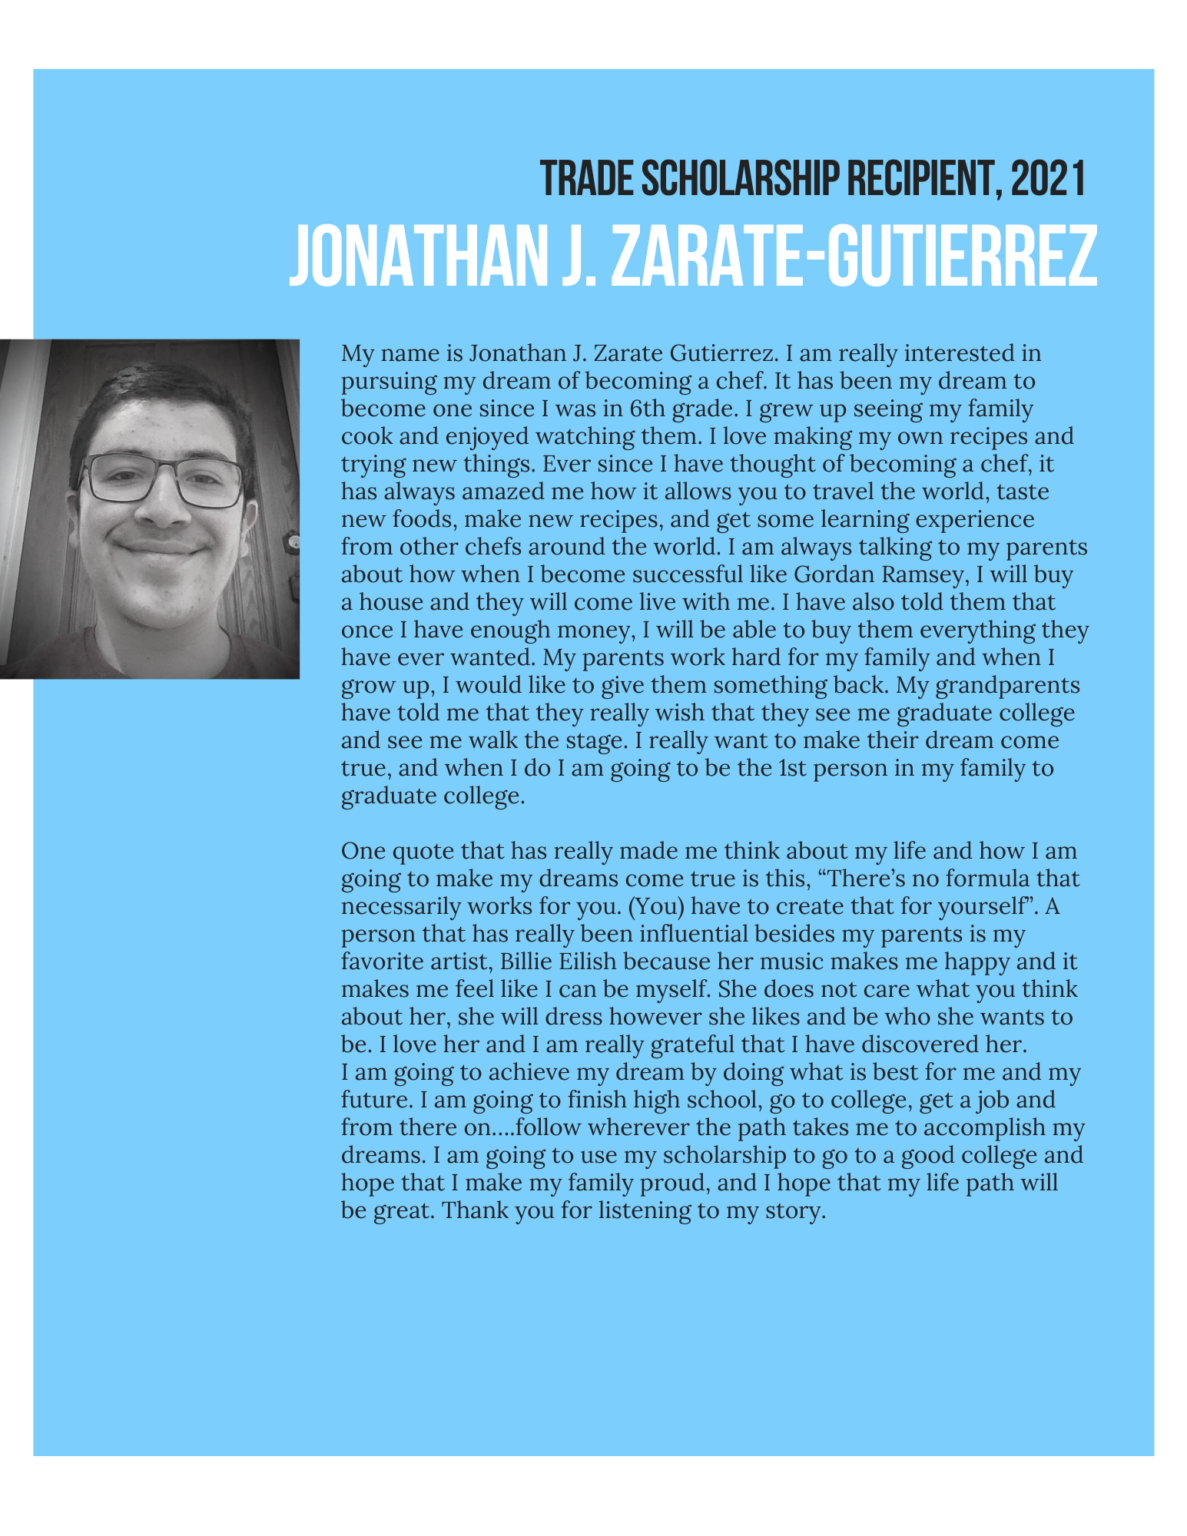 jonathan zarate essay